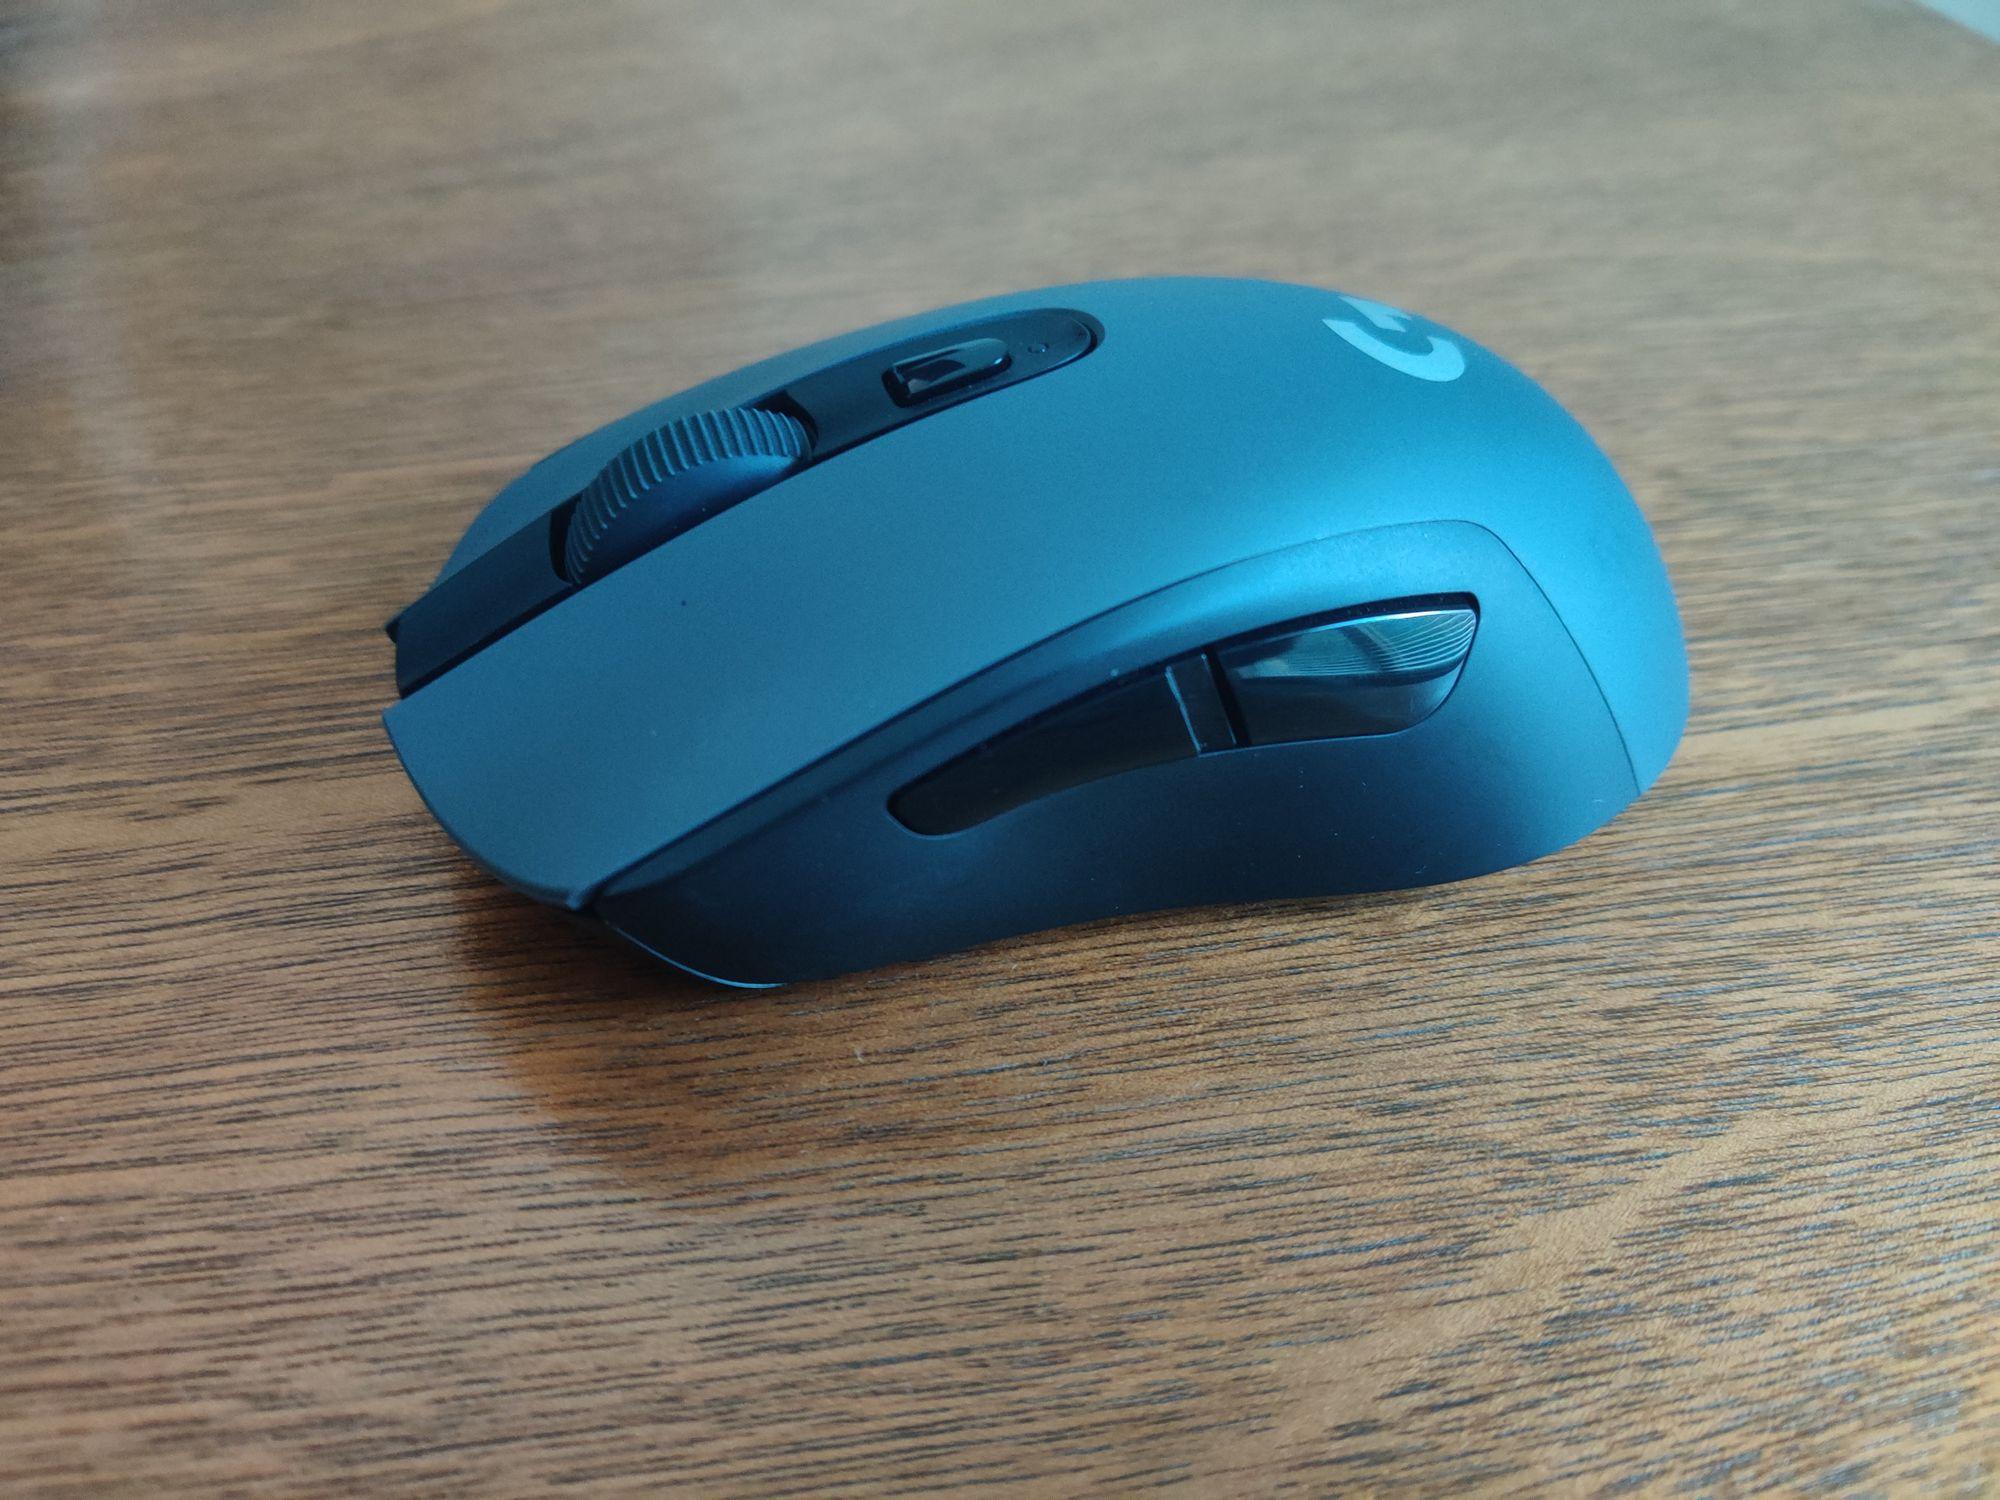 Logitech G603 wireless mouse